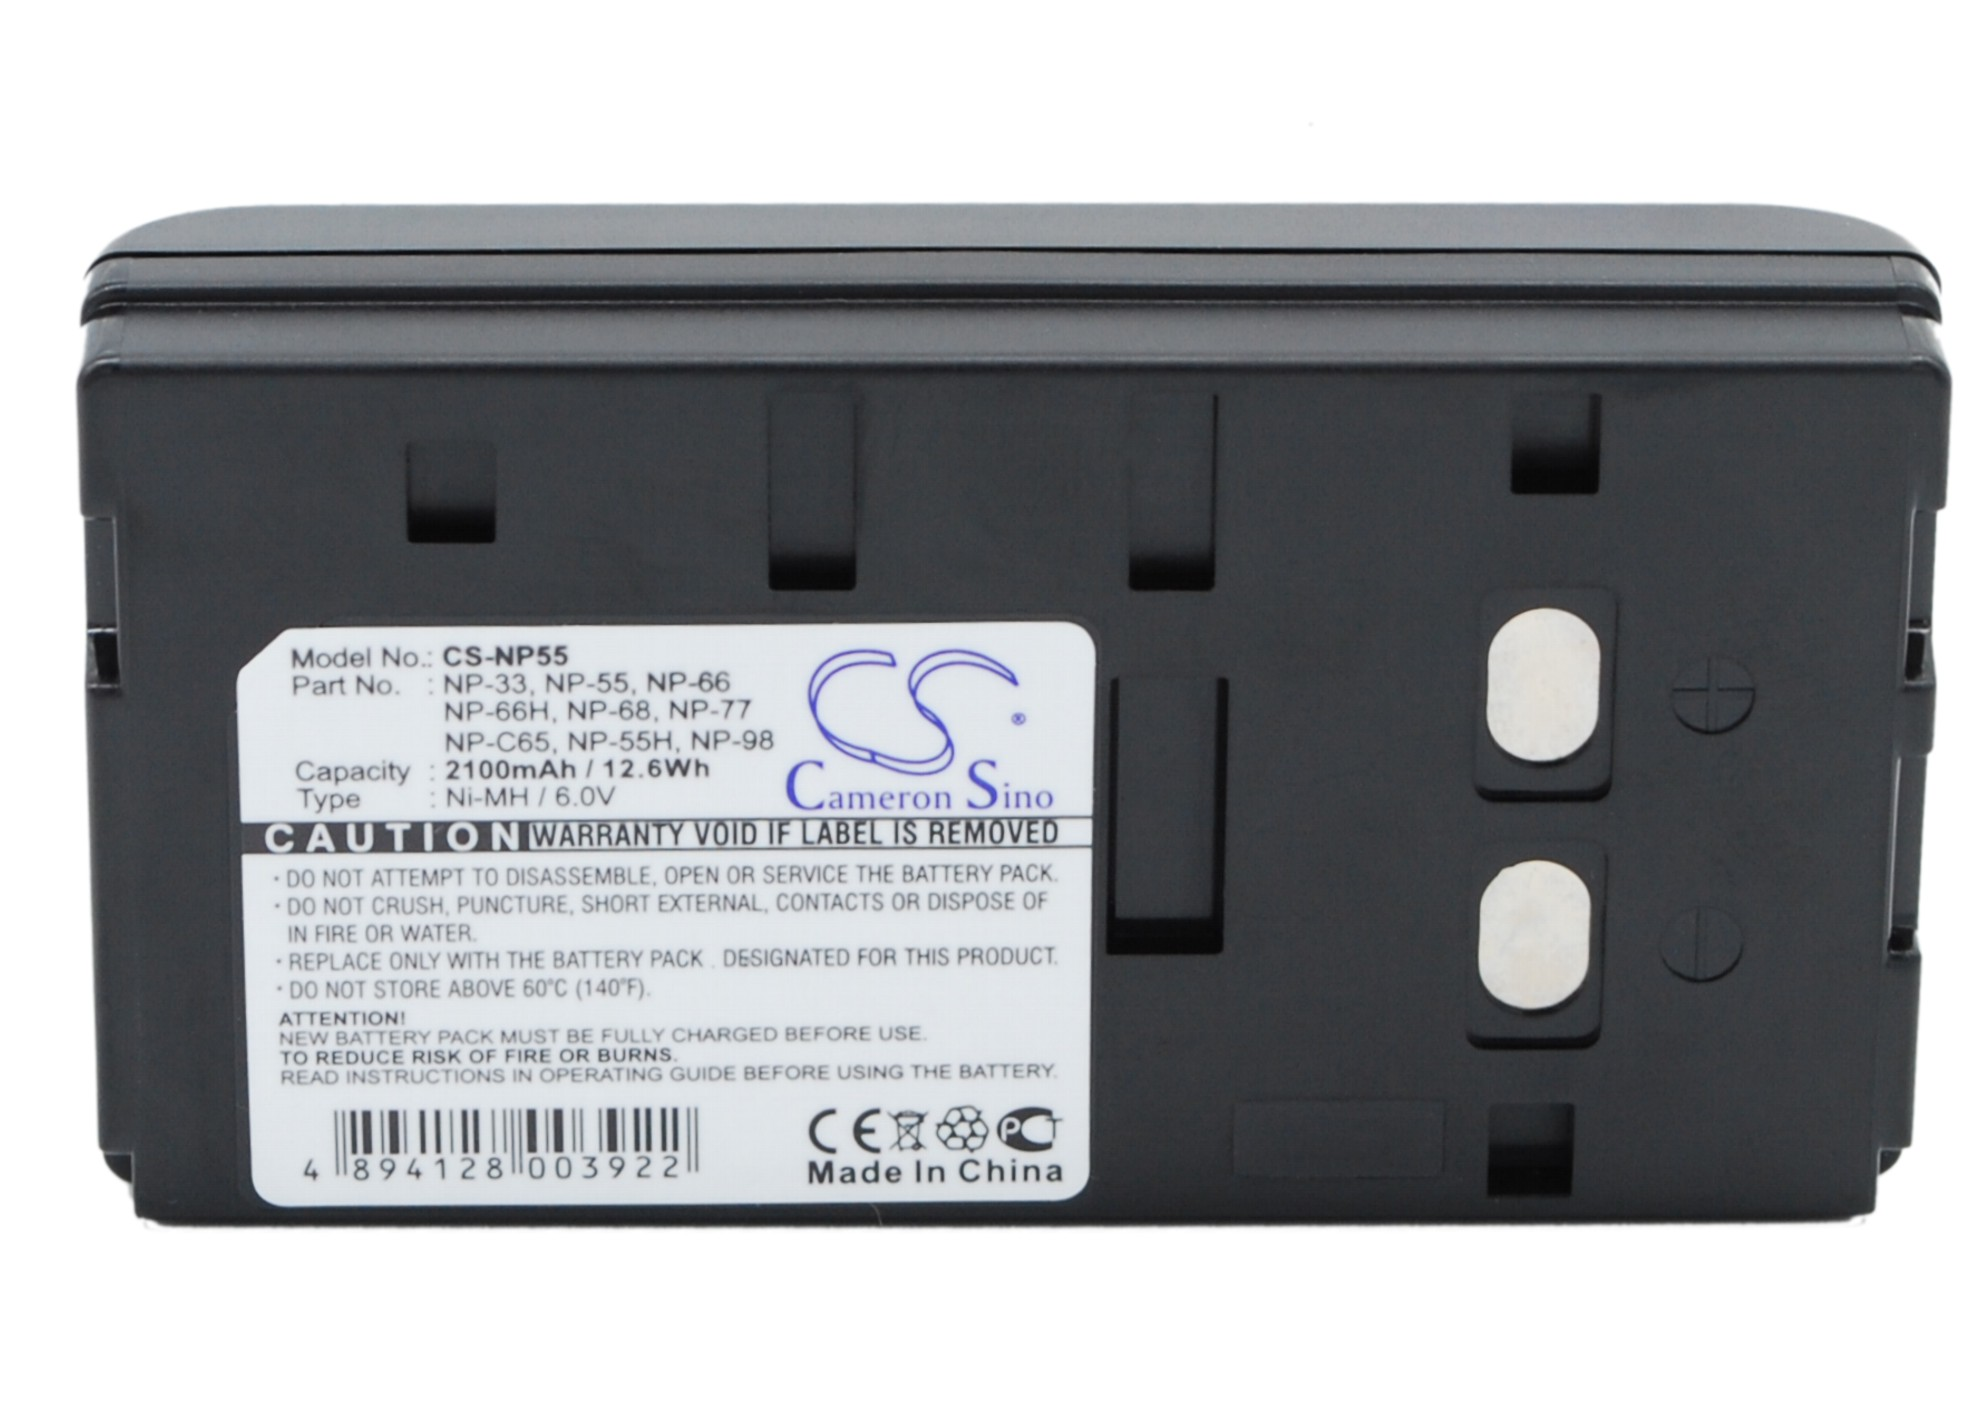 CCD-366BR CCD-TRV73 Premium Battery for Sony CCD-TR99 CCD-TR333E CCD-TRV44E